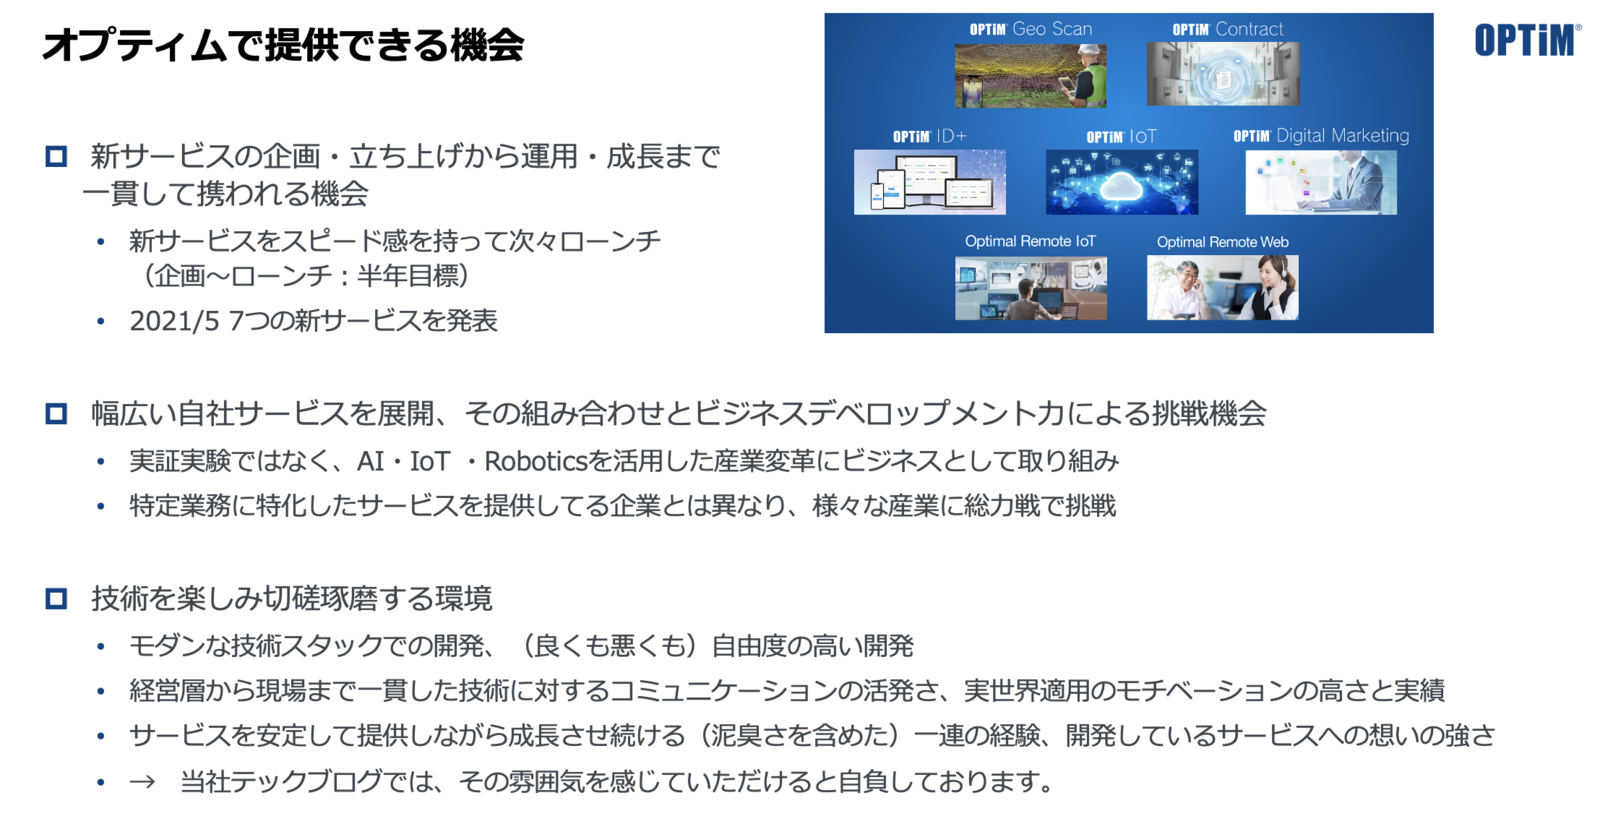 f:id:optim-tech:20210908212522p:plain